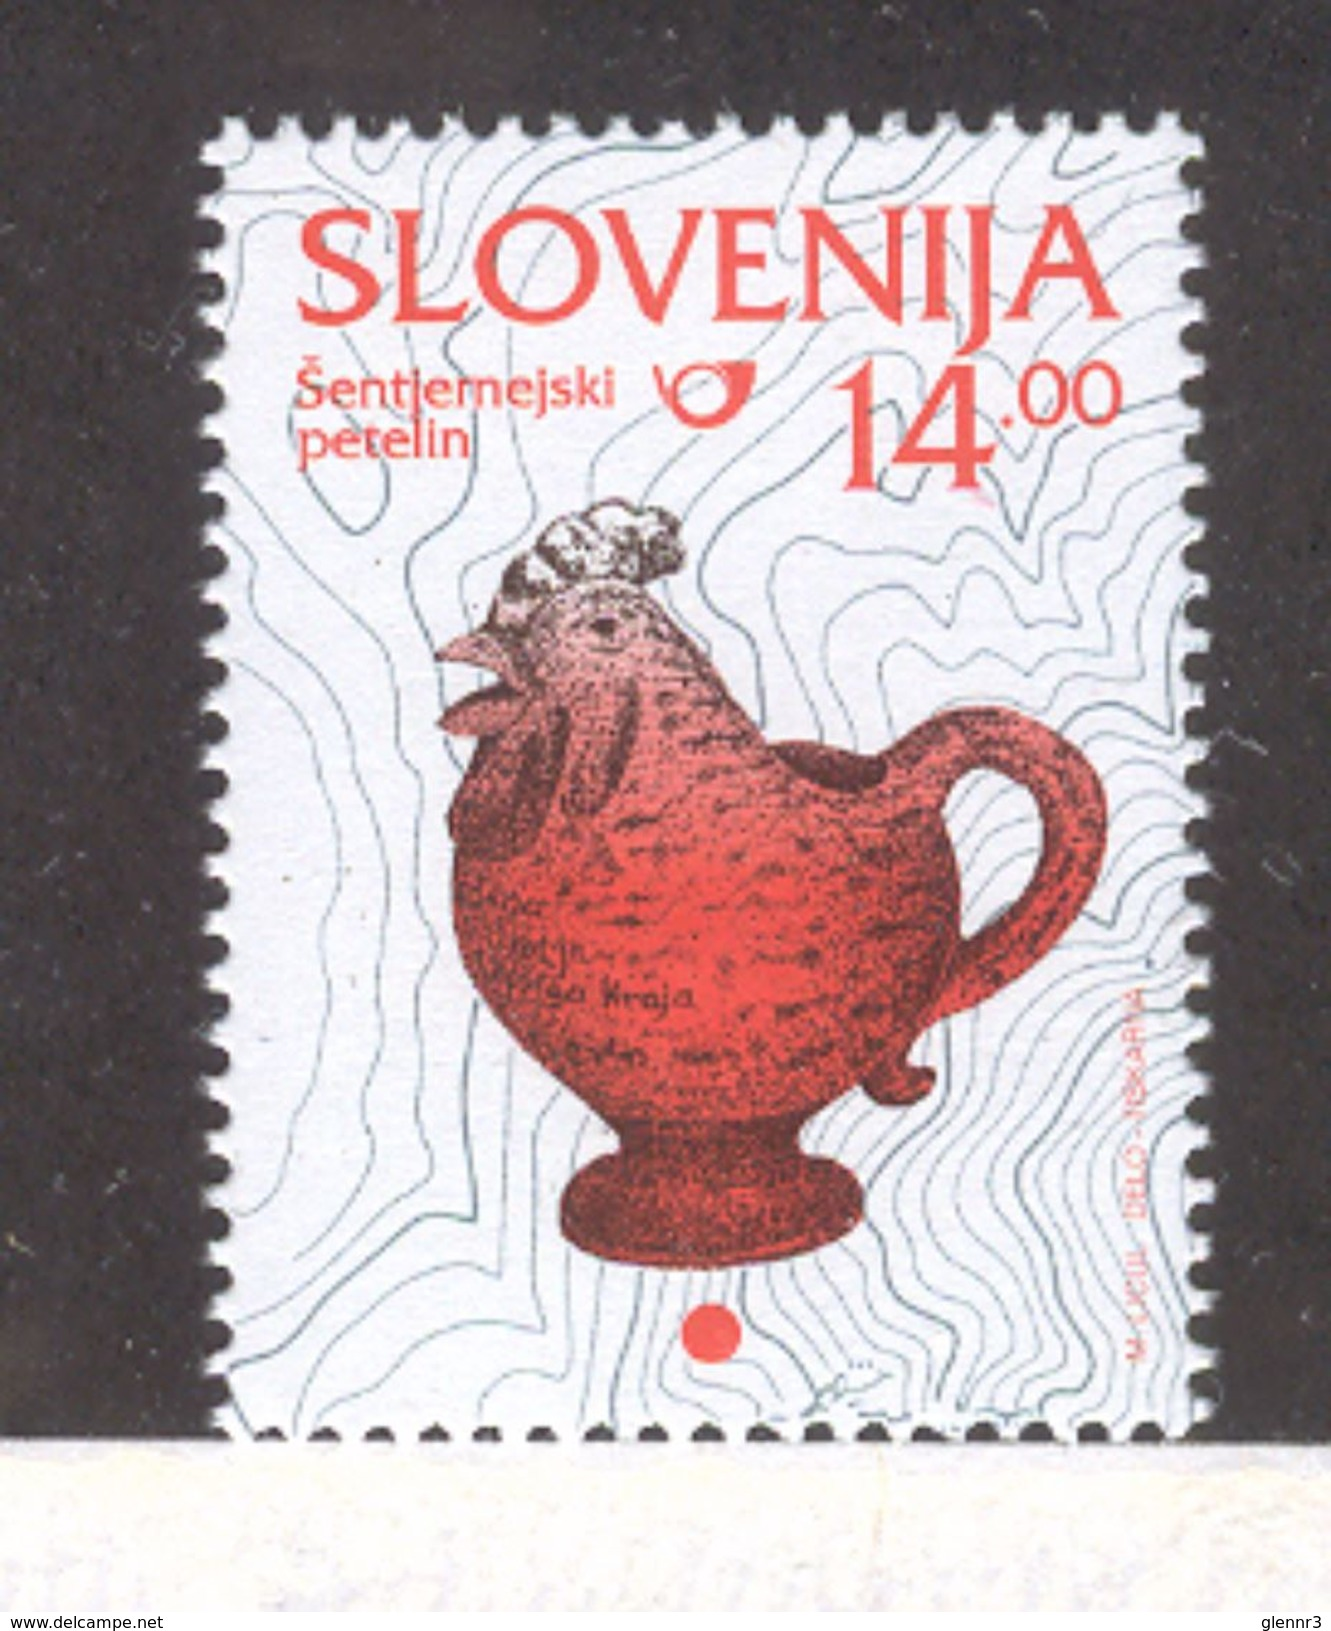 SLOVENIA 1997 Pottery Cock 14t Definitive, Scott Catalogue No. 208B MNH - Slovenia